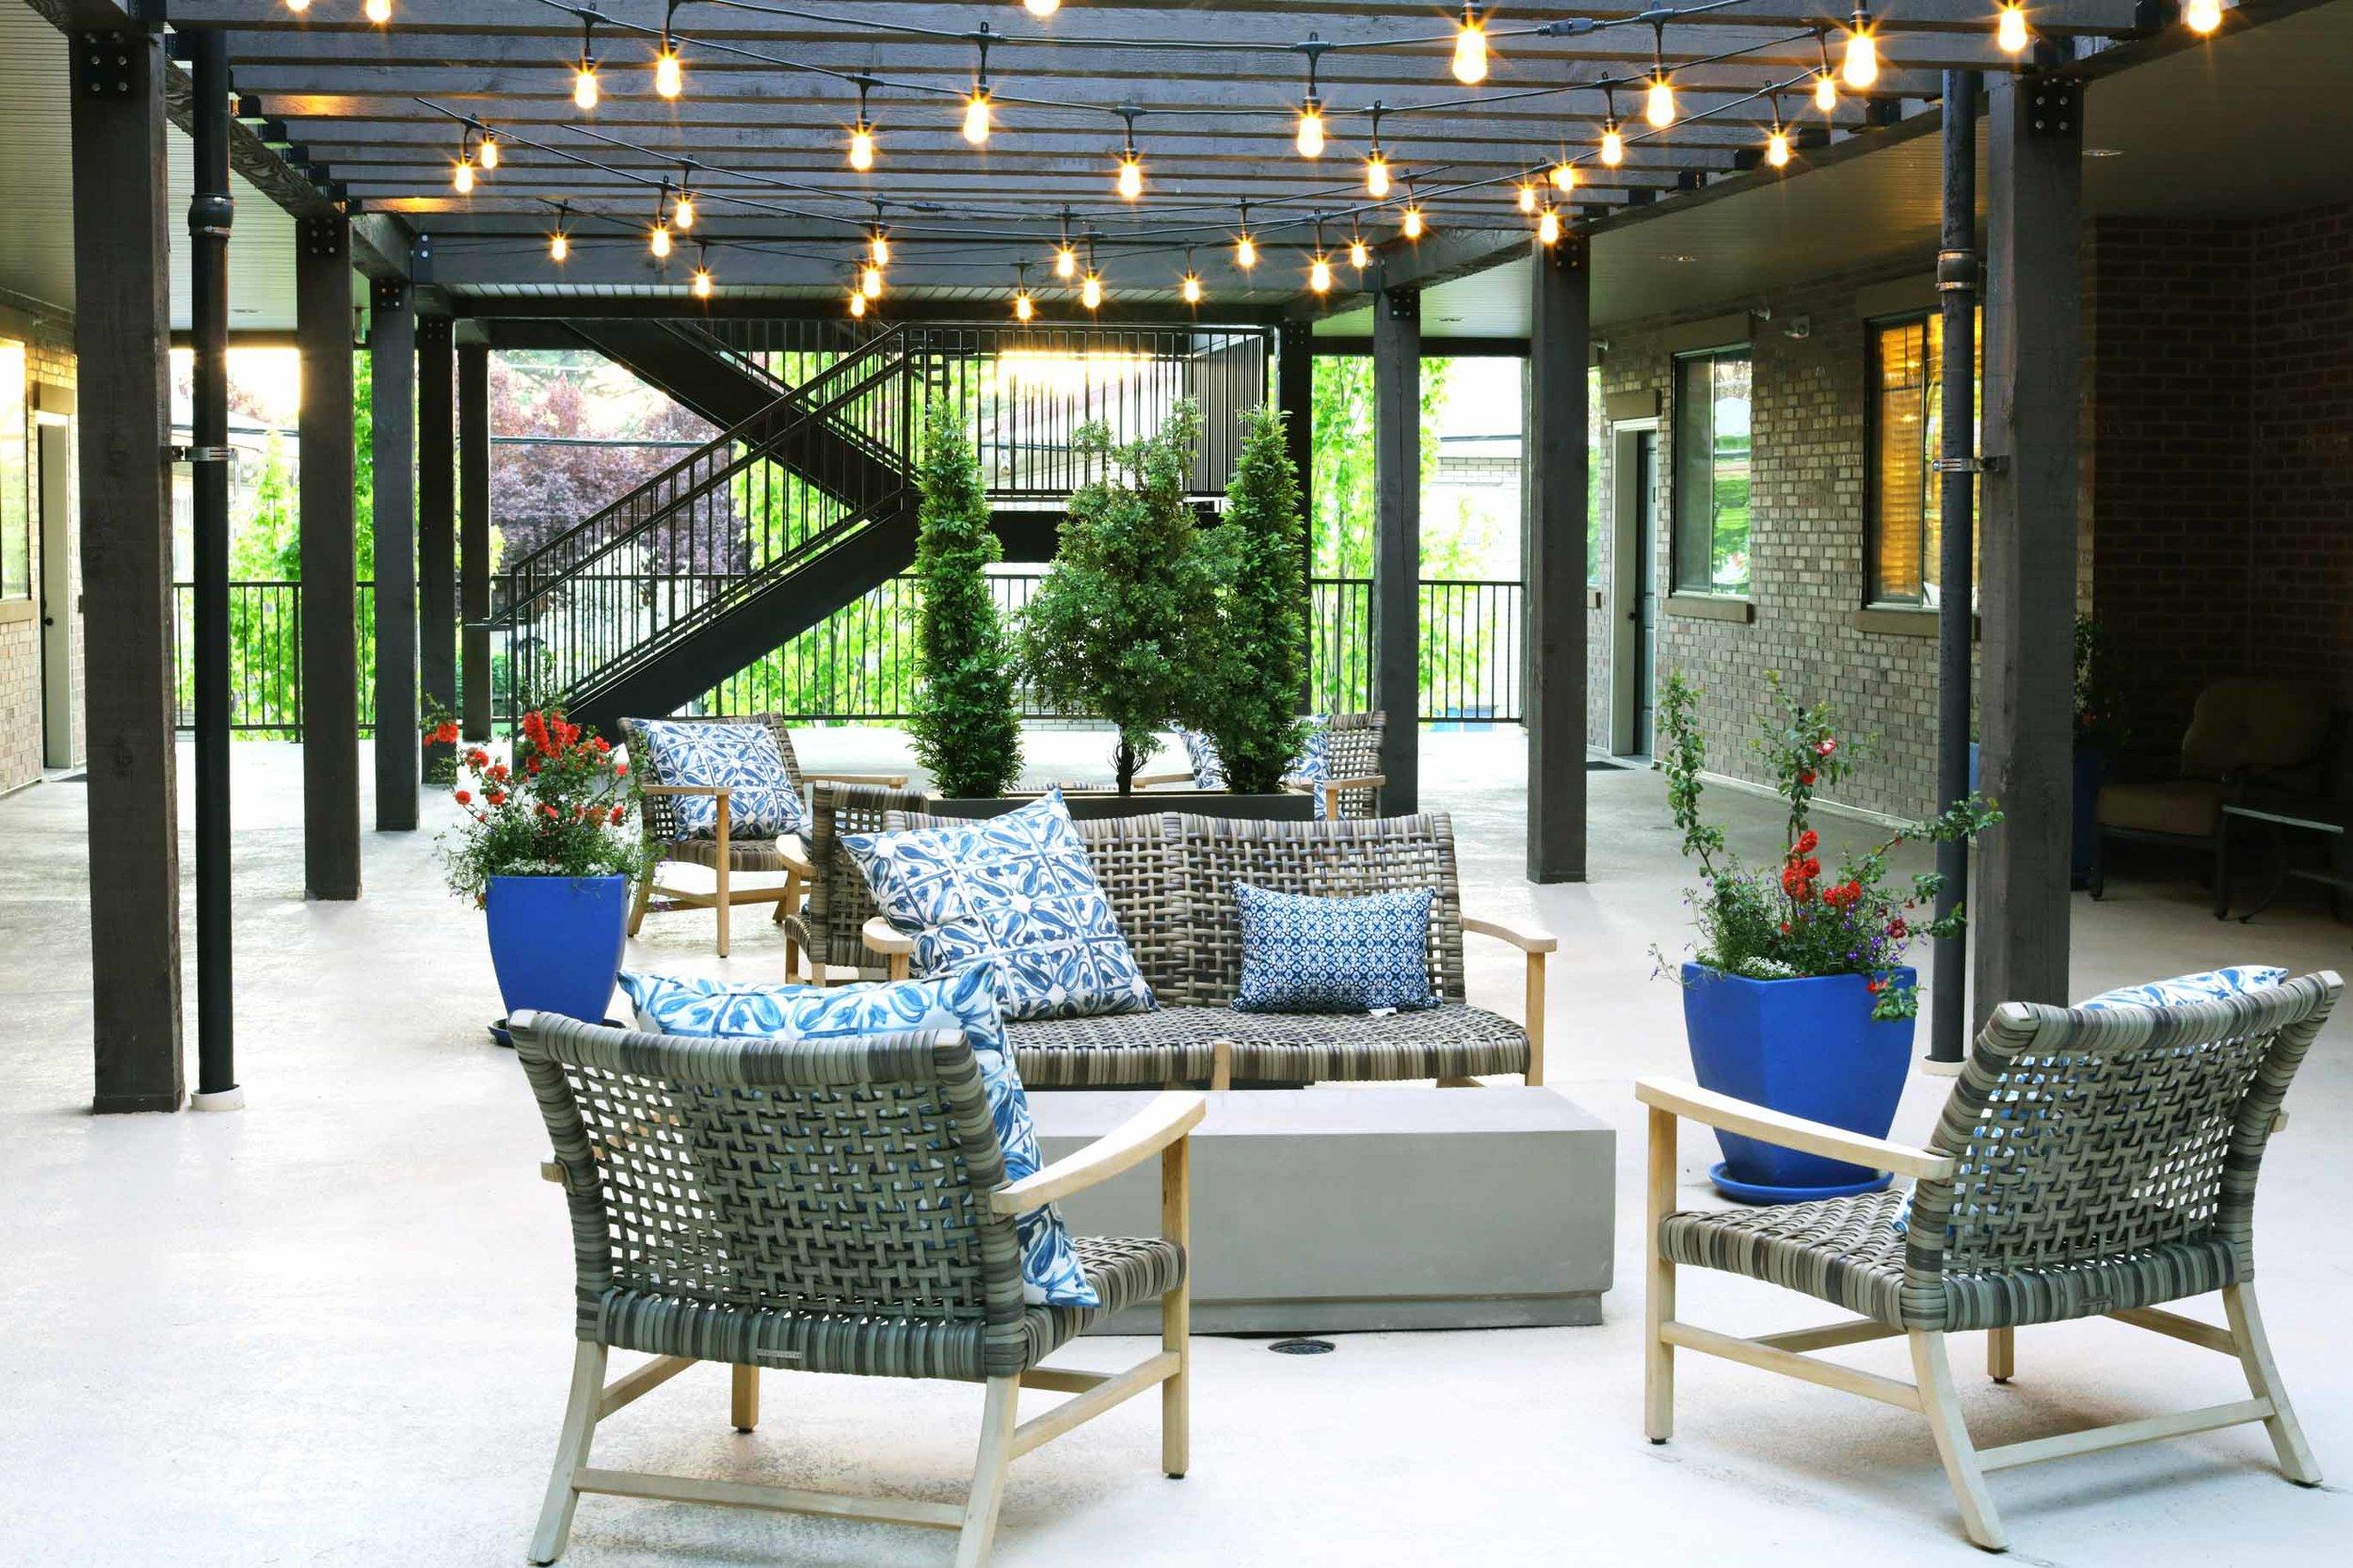 Courtyard gathering spot